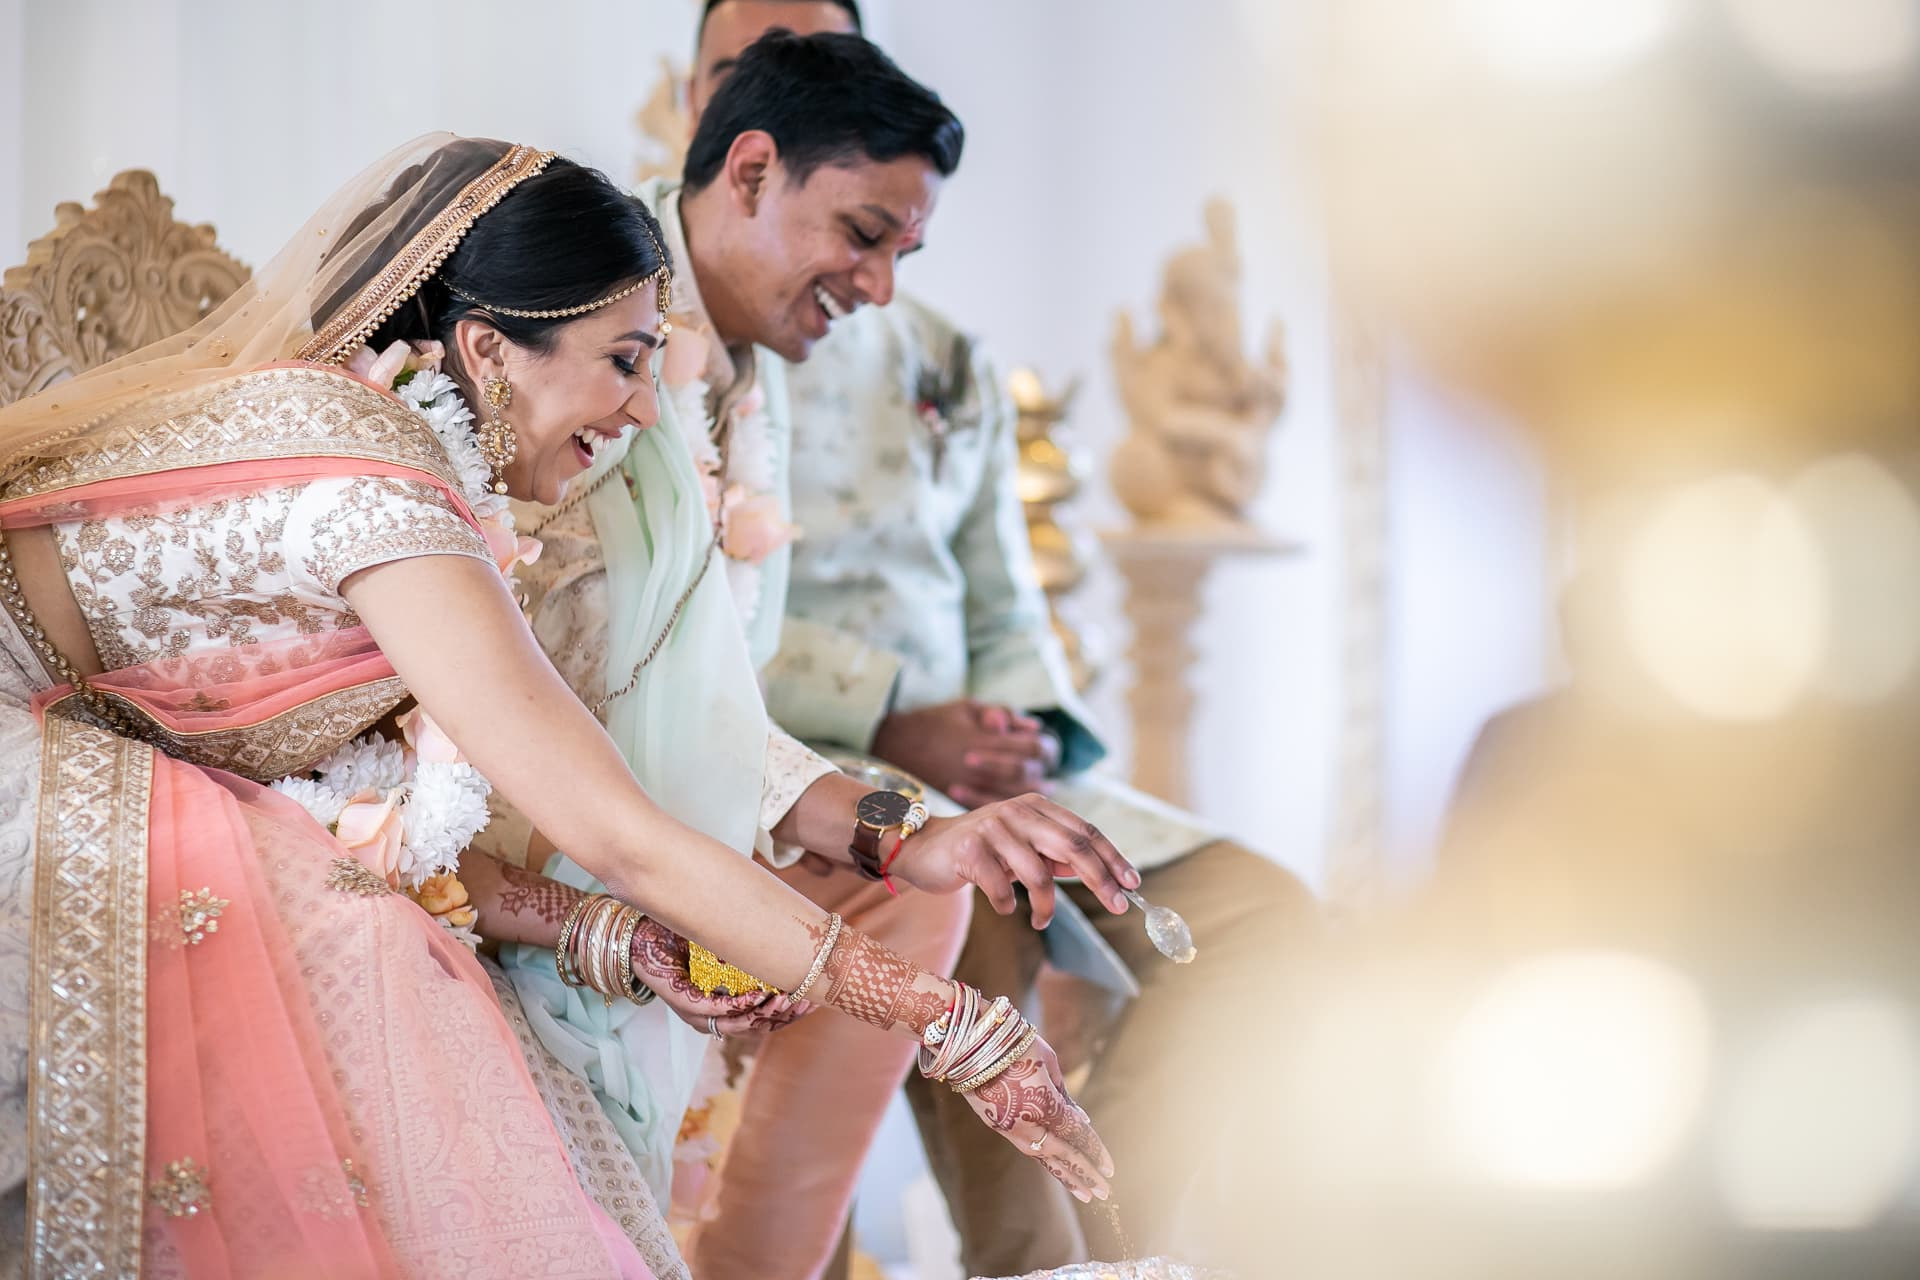 Bride and groom feeding fire